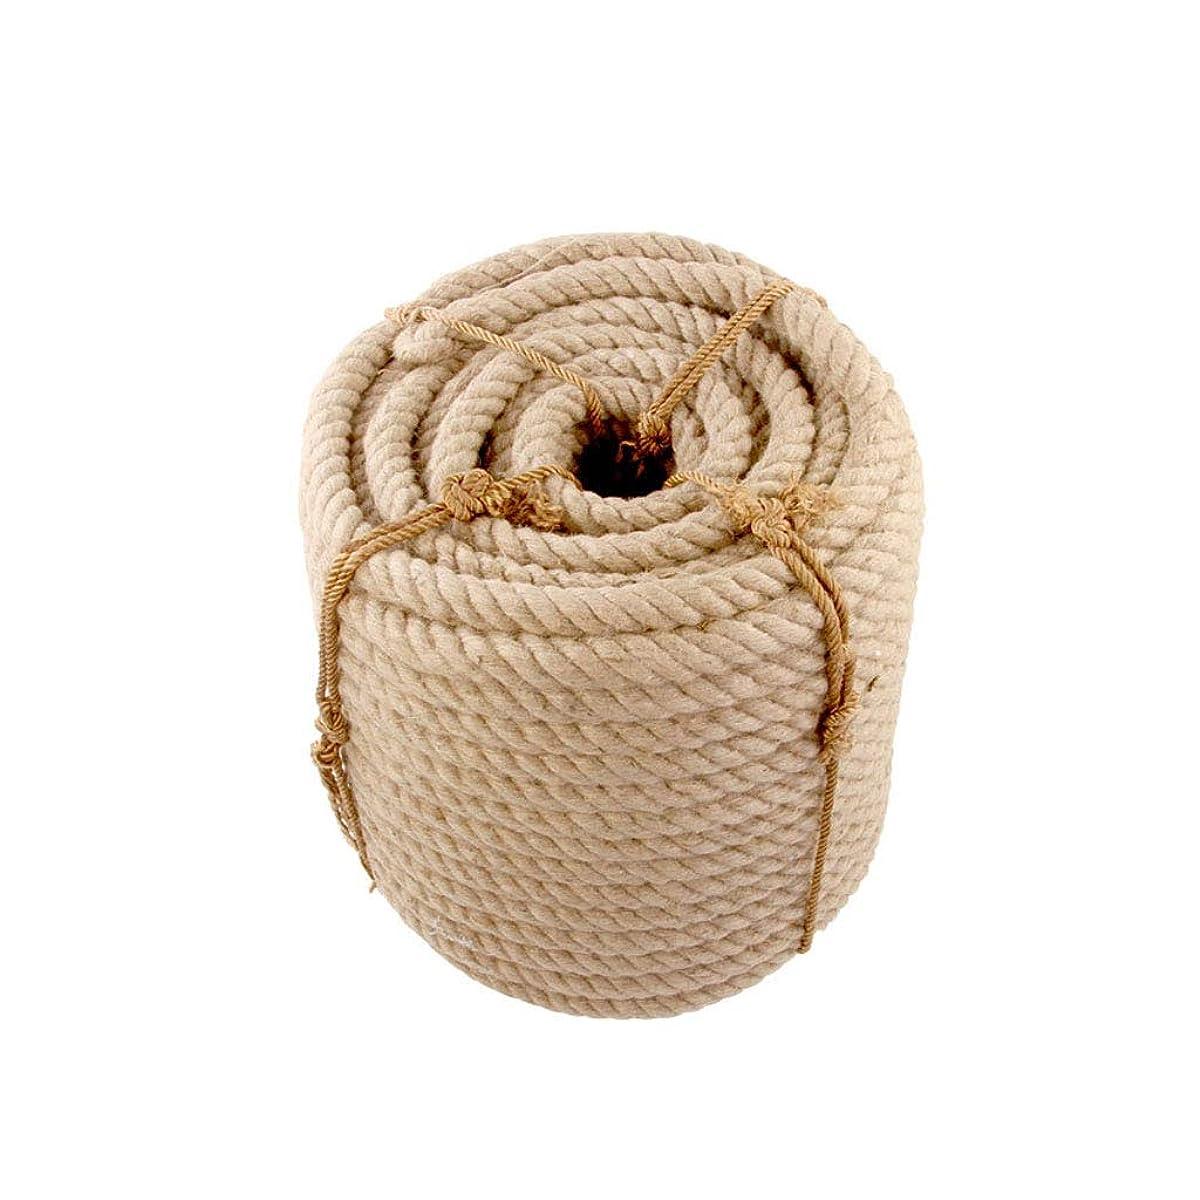 MEI XU Climbing Rope Hemp Rope - 26mm/30mm 5-10m Jute Ropes Twine Natural Hemp Cord Rustic Country Craft DIY Handmade Accessories Nordic Home Decor Cat Pet Scratching